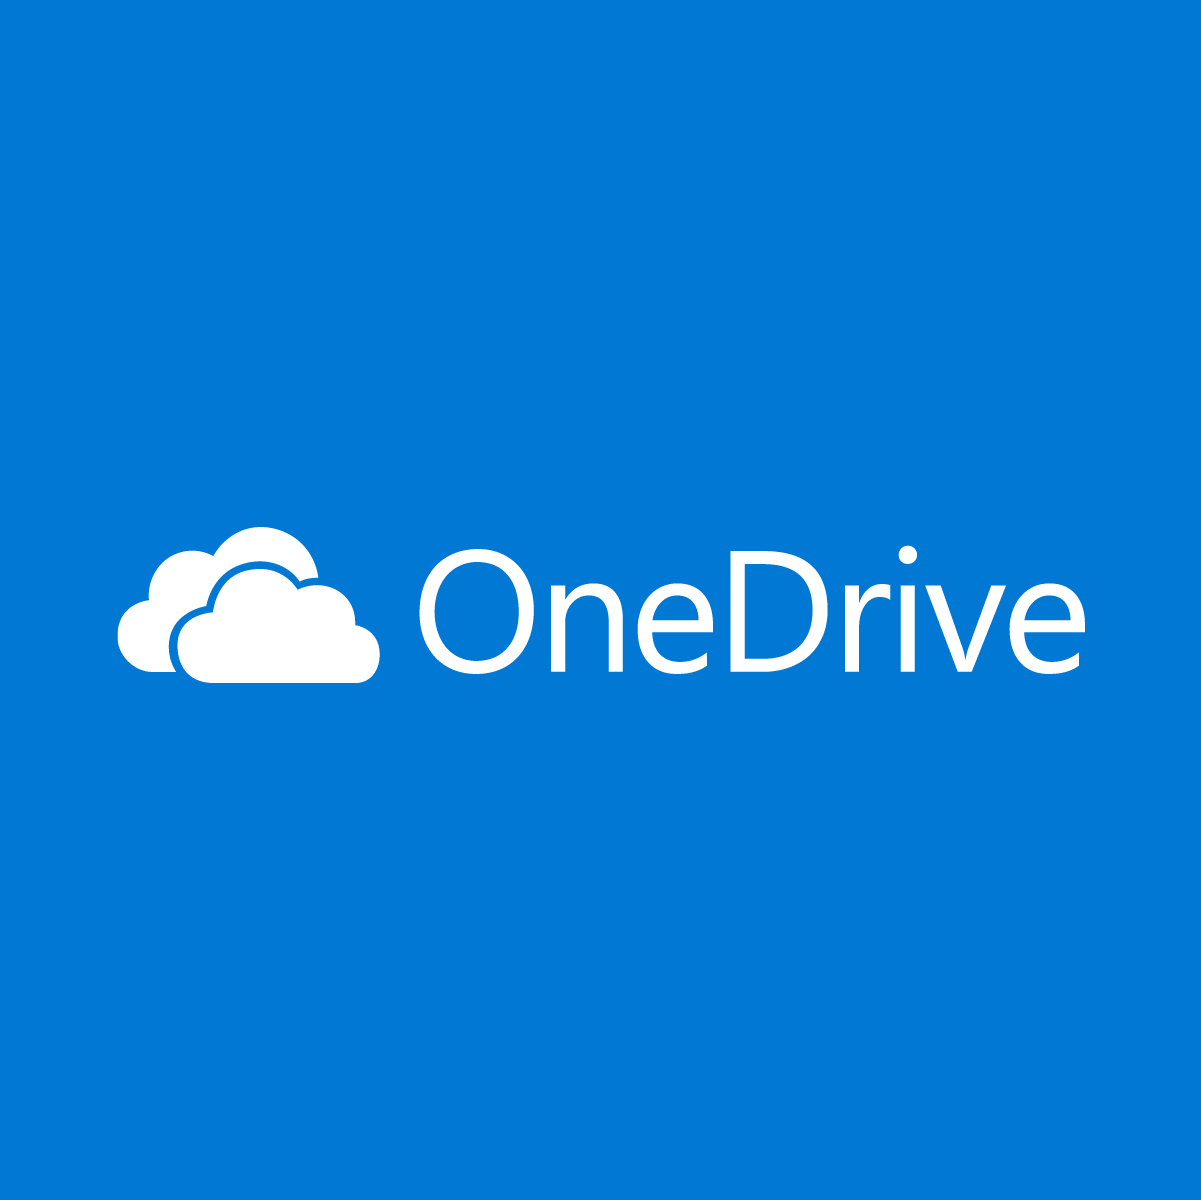 Microsoft Announces OneDrive Personal Vault 8